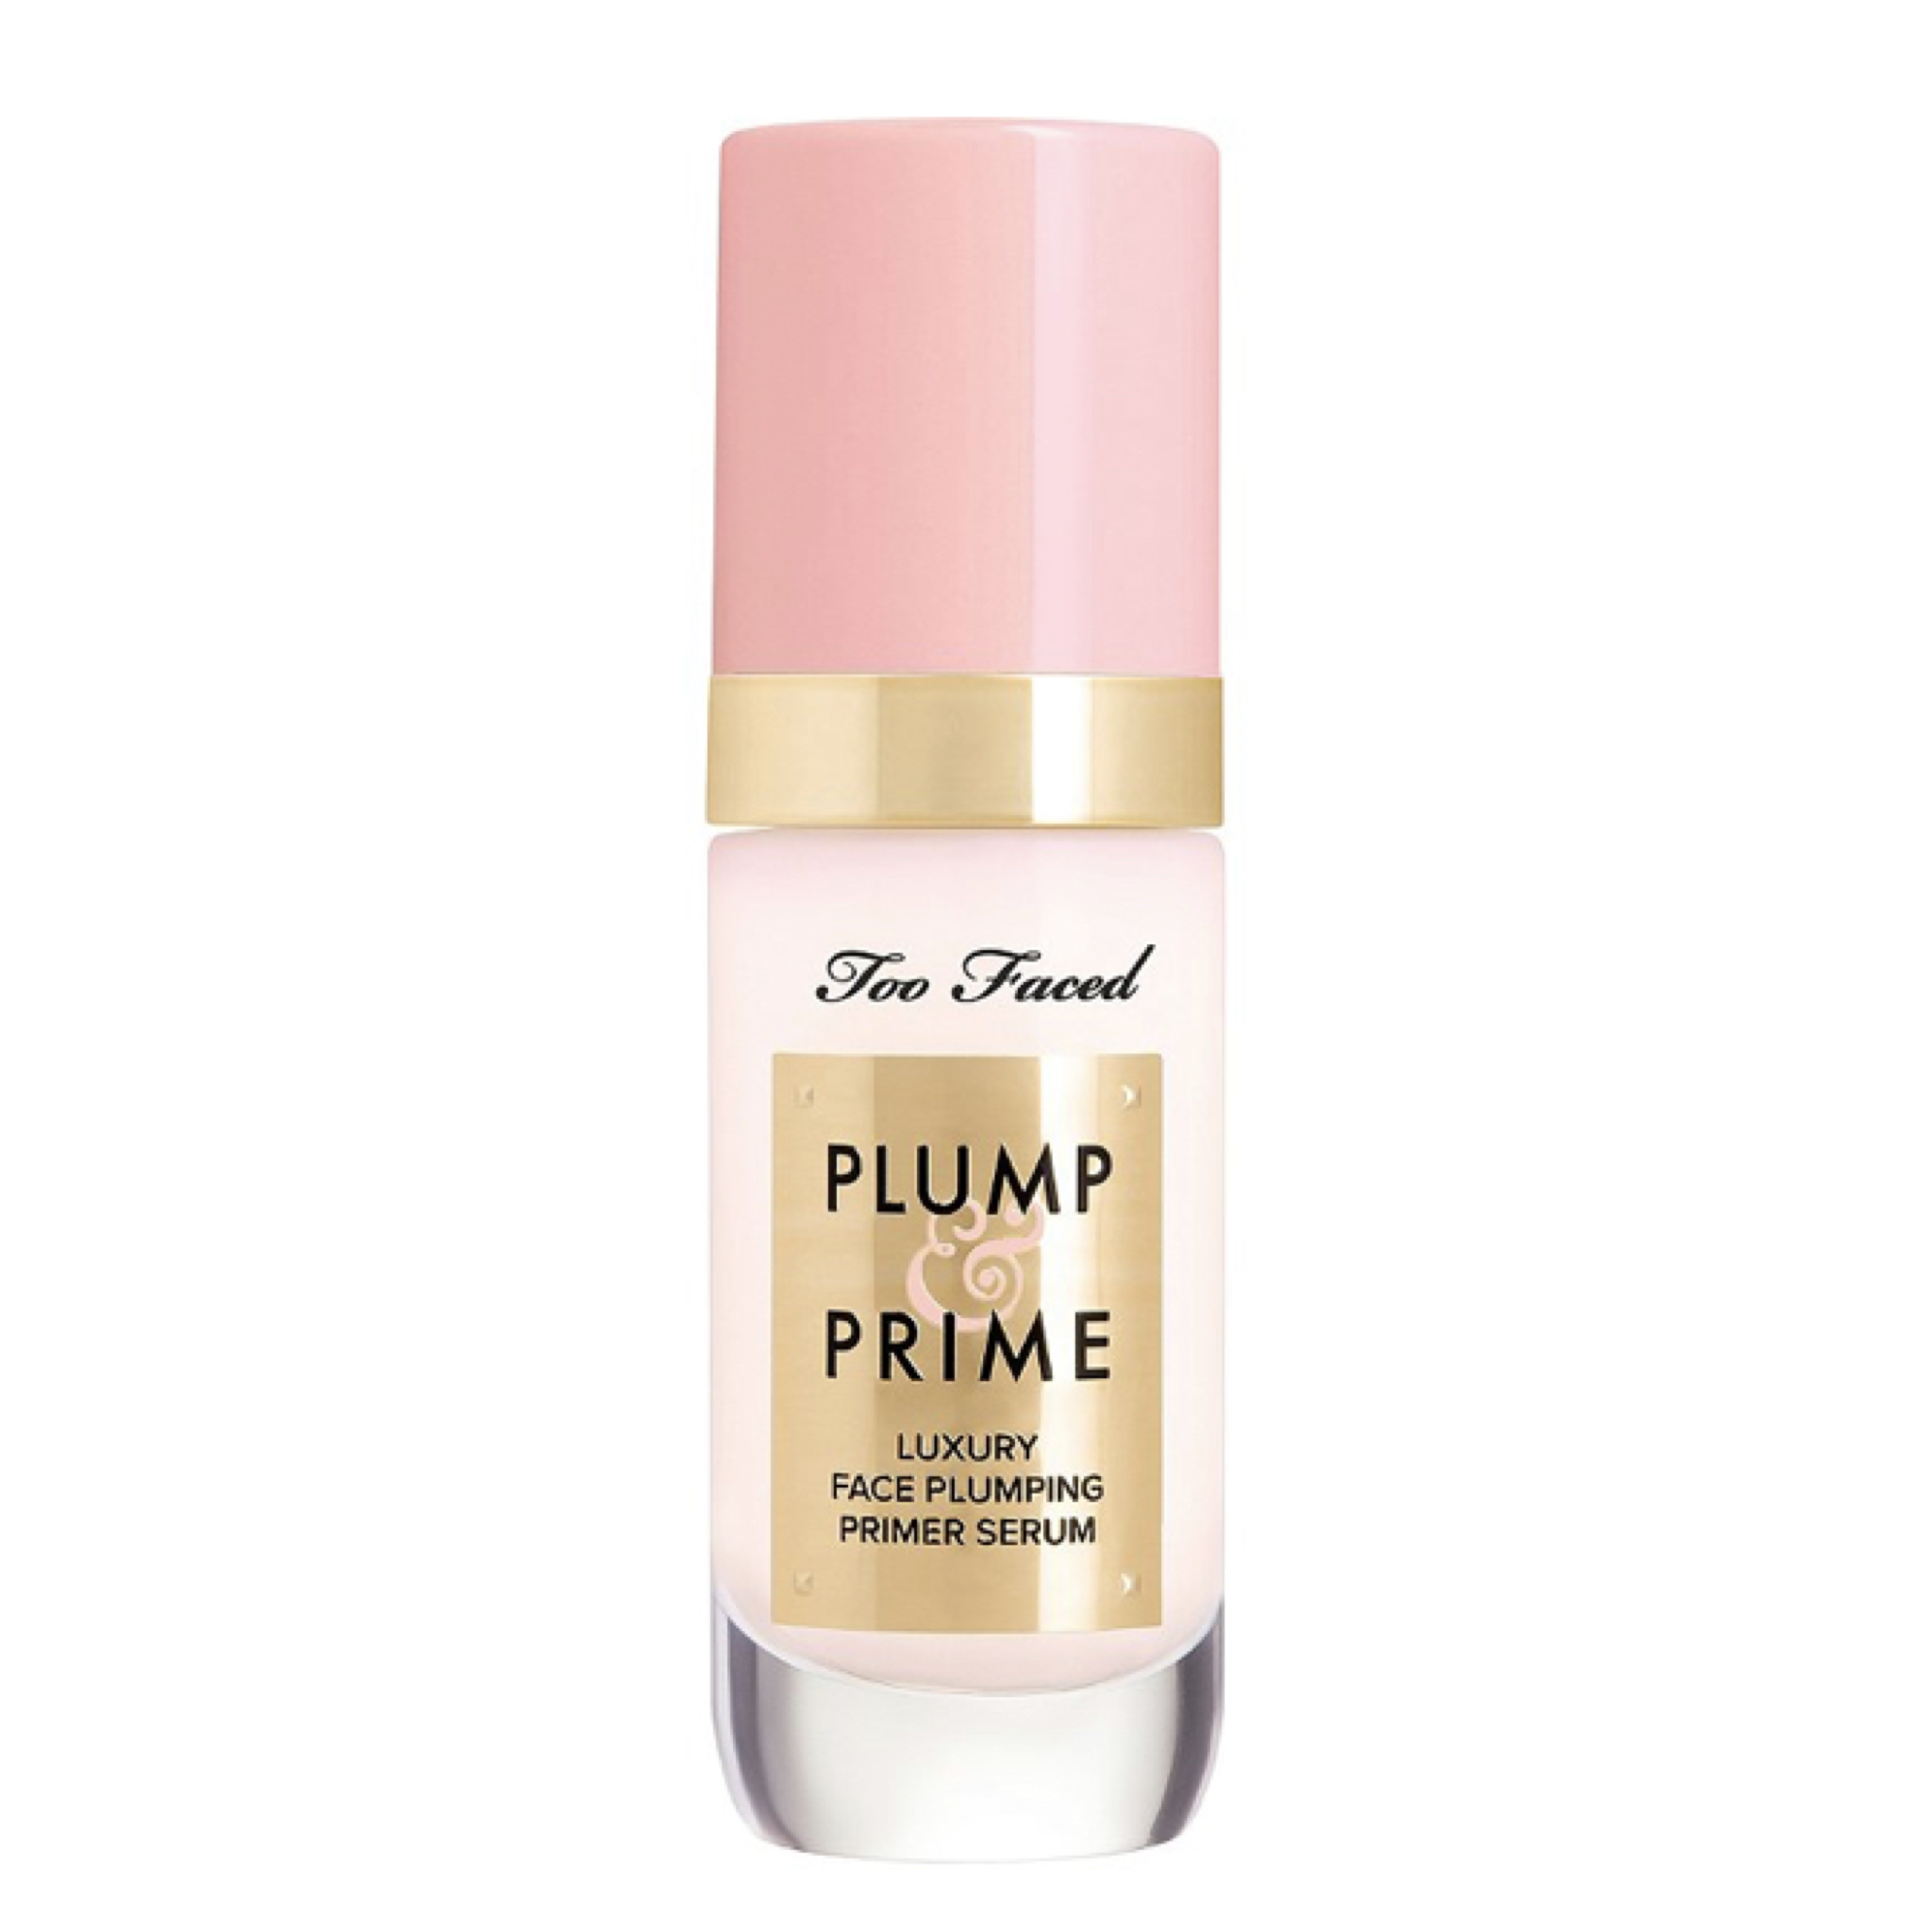 Too Faced Plump & Prime Face Plumping Primer Serum